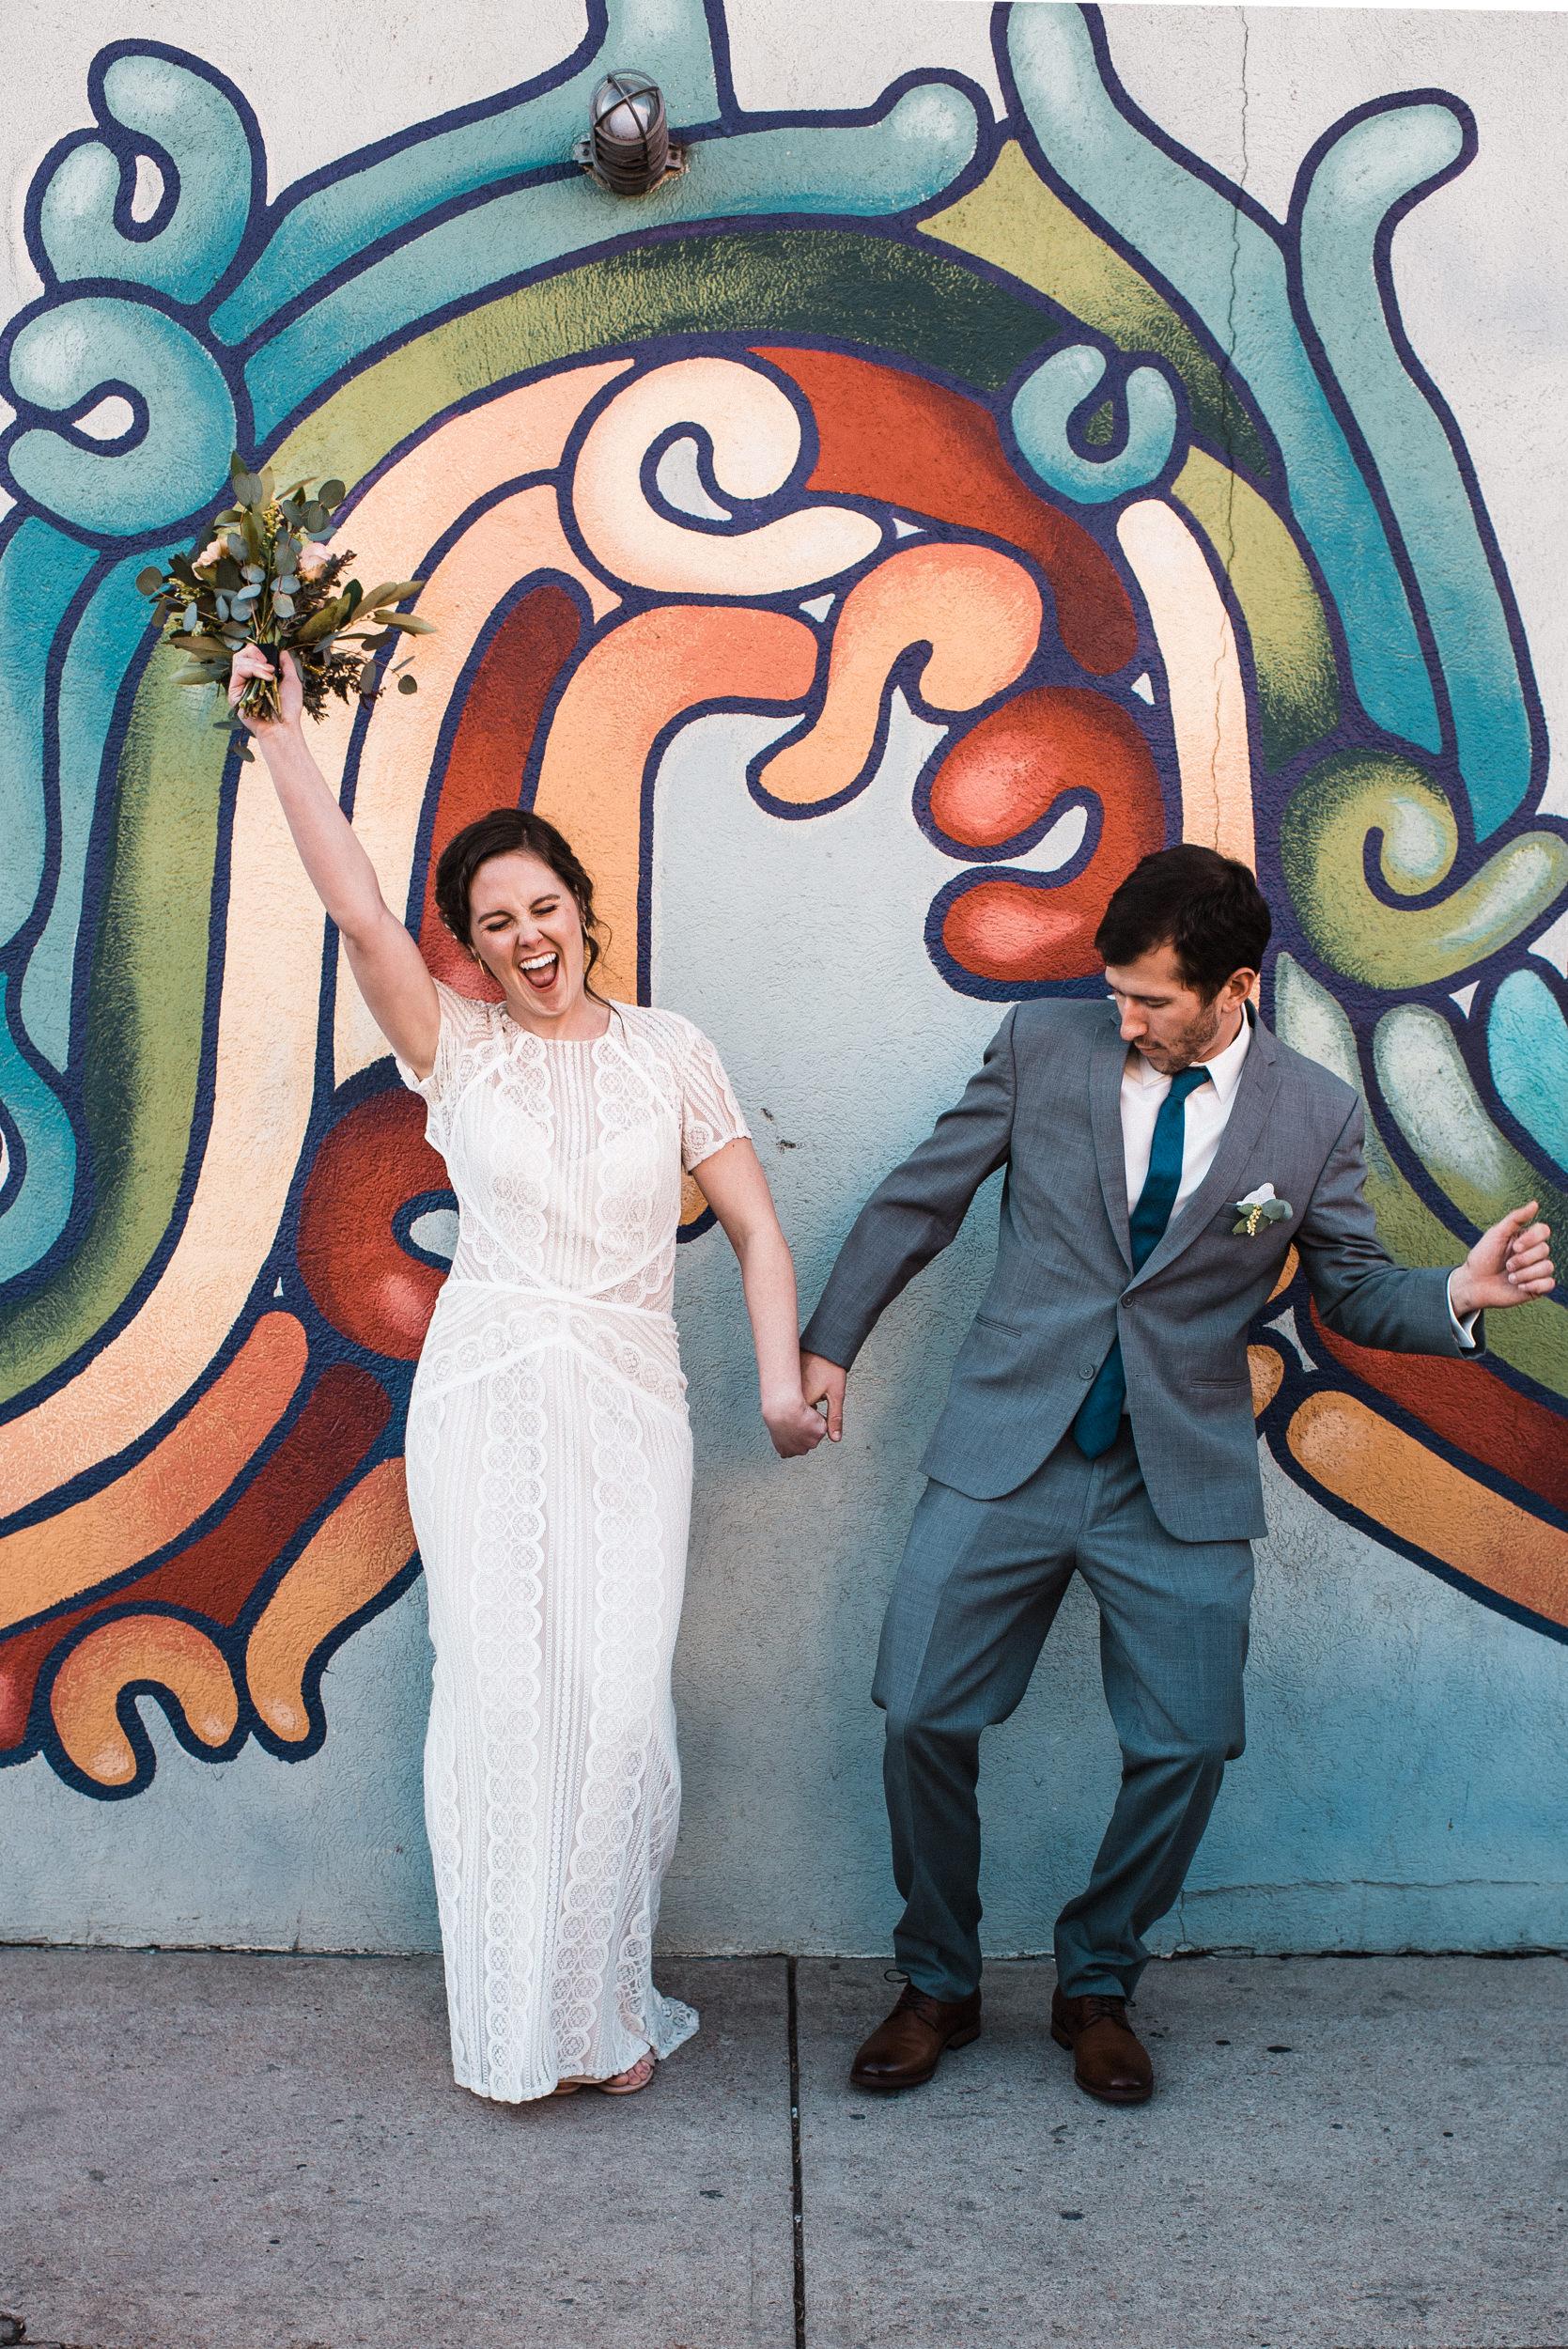 Colorado Denver Street Photography Wild wedding Dance-Best Street Photographer